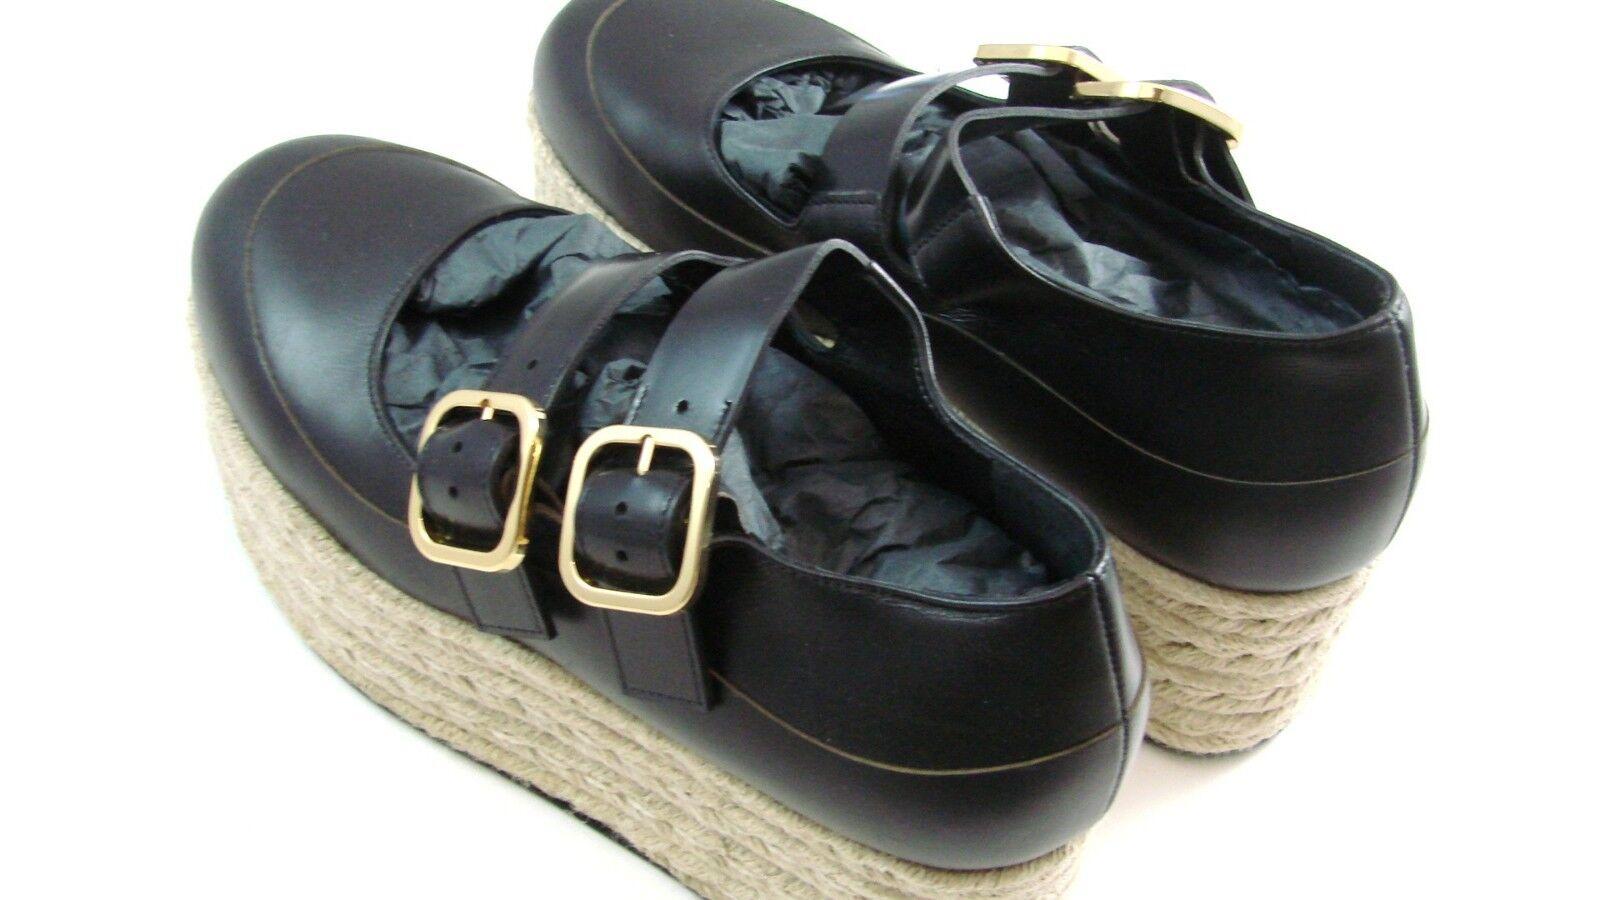 MARNI Chaussures femmes double boucle en cuir Mary Jane Espadrilles Espadrilles Espadrilles Euro 37  1120 ea0e4f